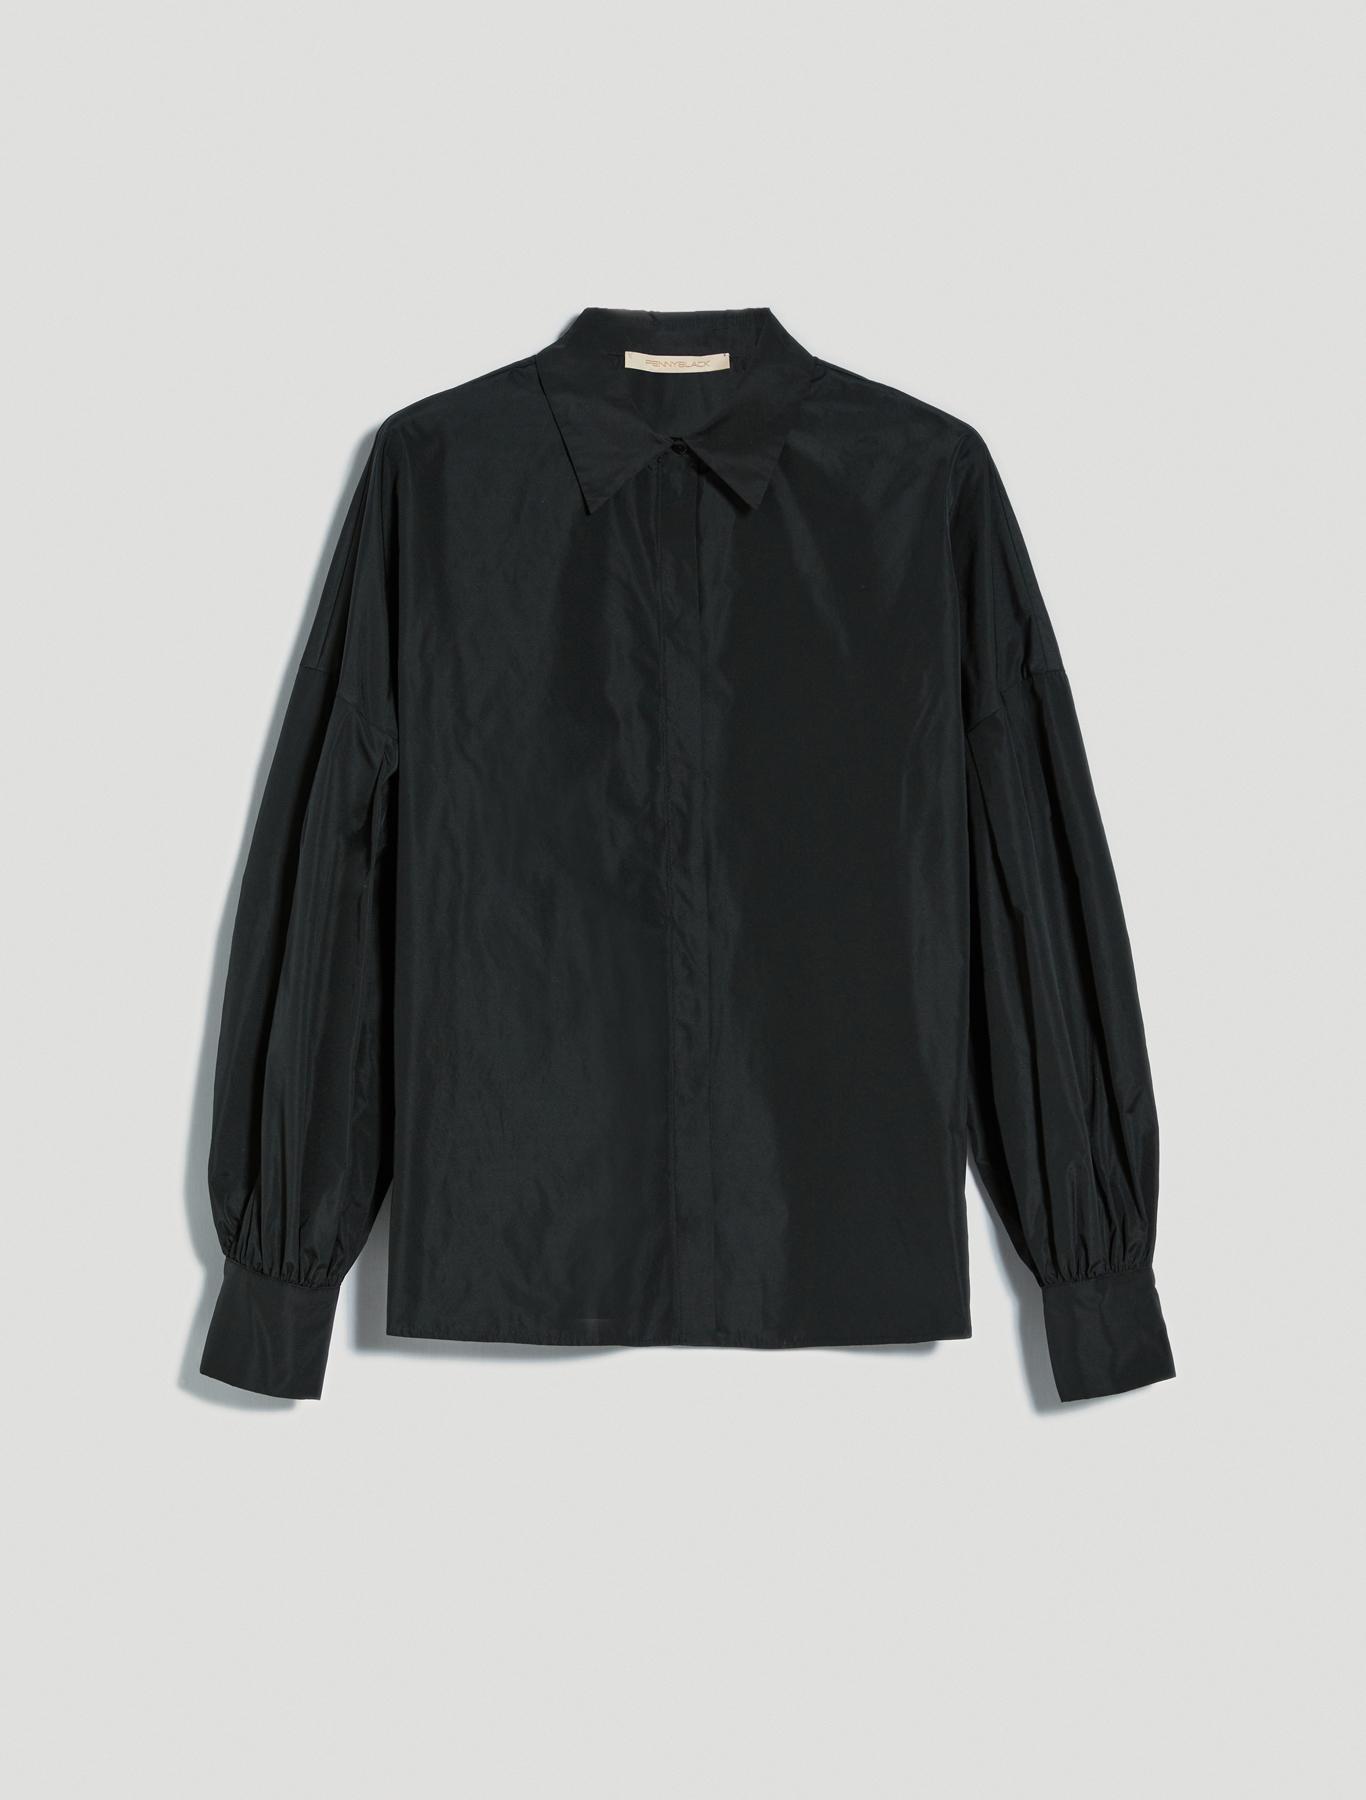 Shirt with balloon sleeves - black - pennyblack